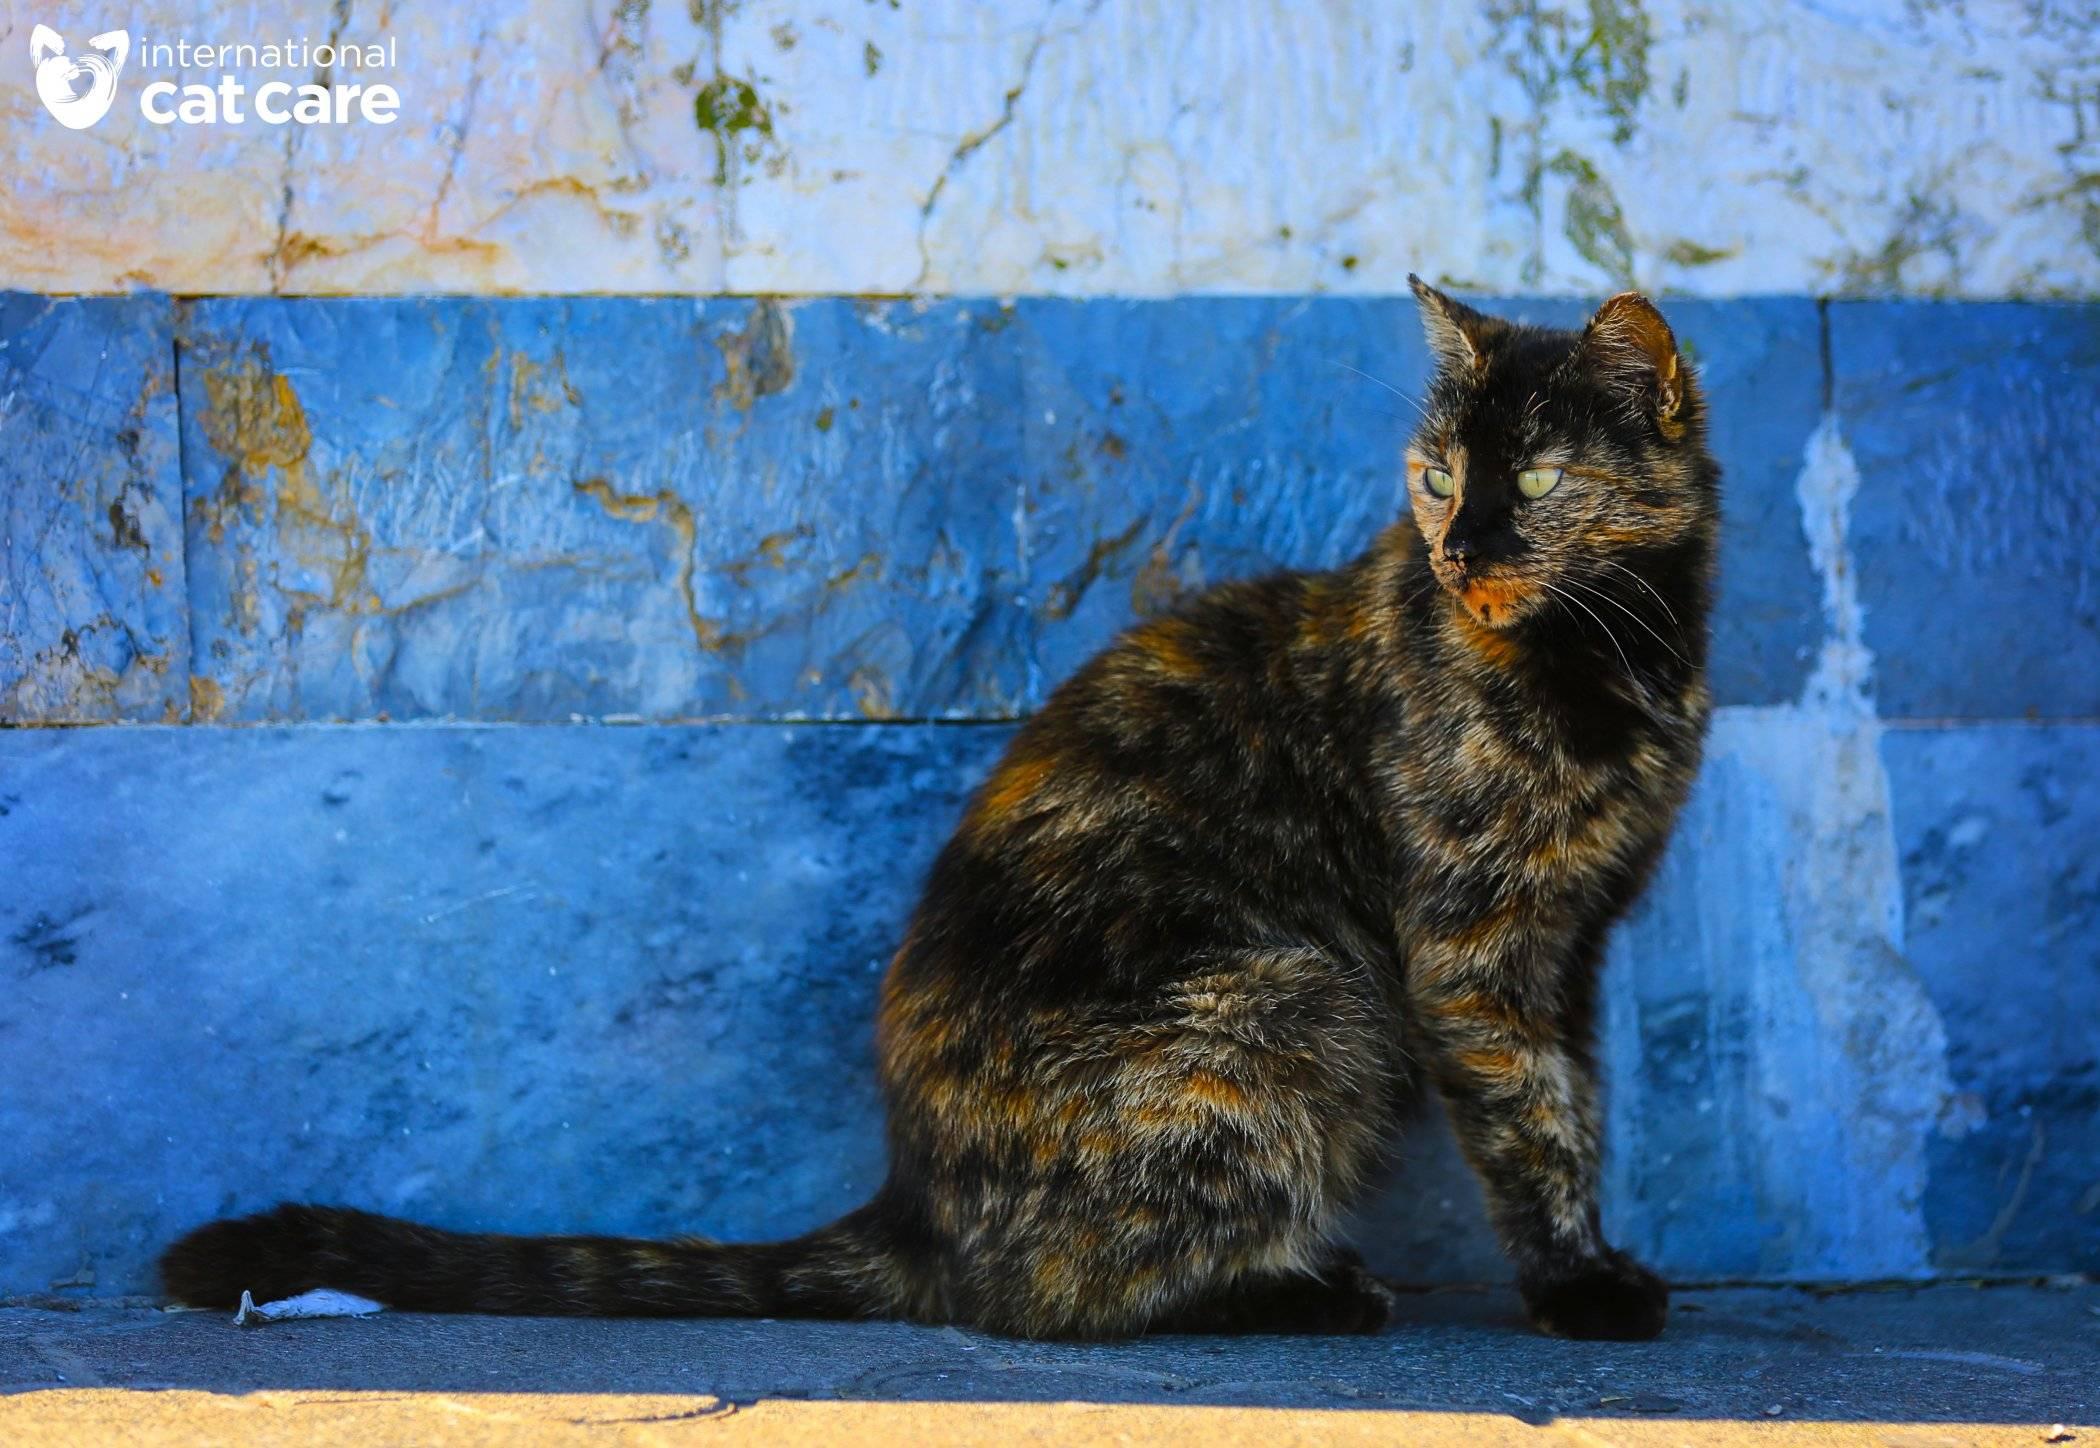 Street Cats Winner – Seyed Mohammad Fallah Firouzkouhi